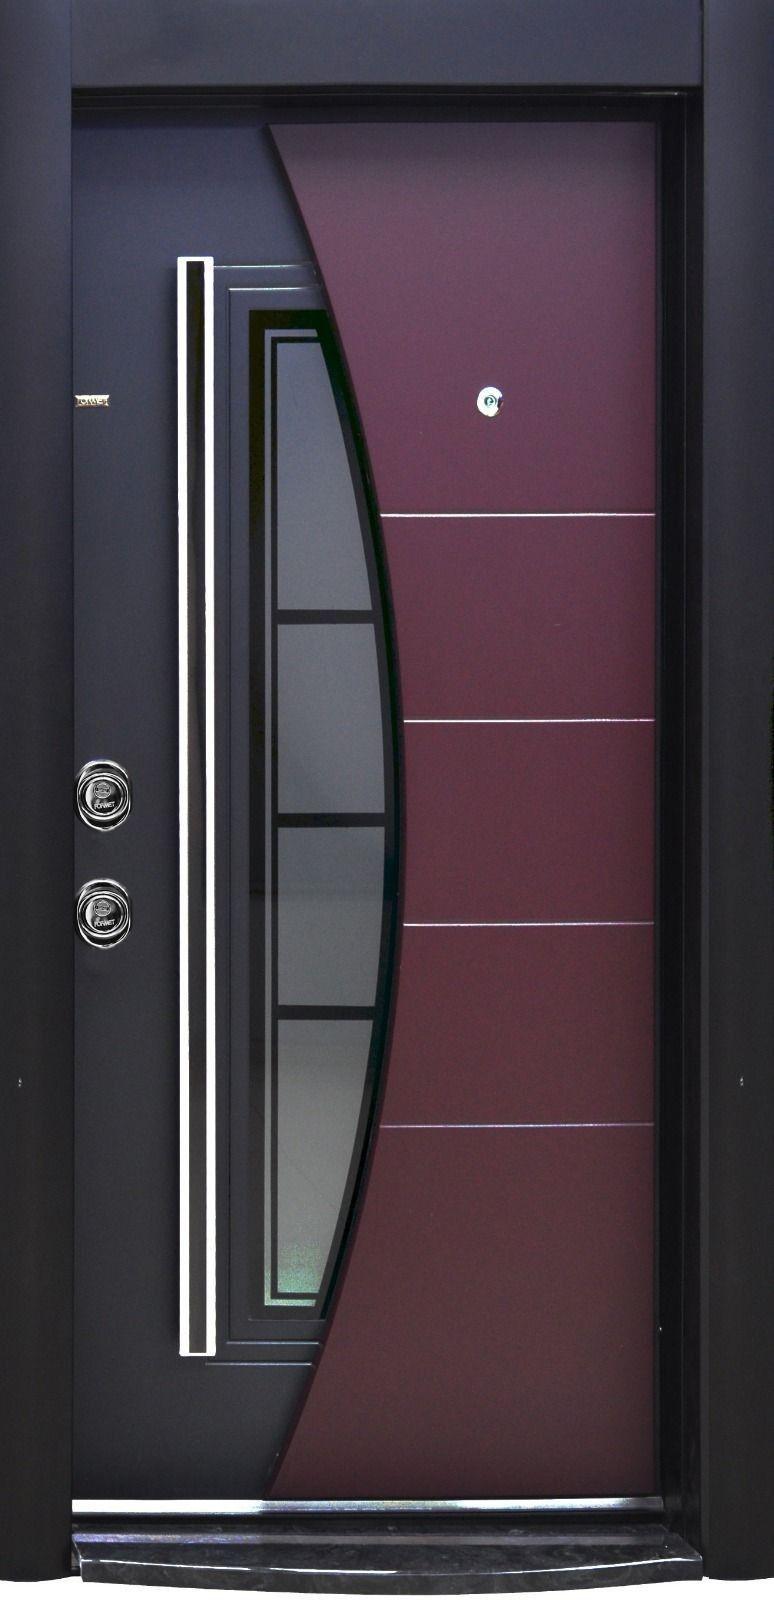 Pin by victor candido martinez torrejon on zorzal Door